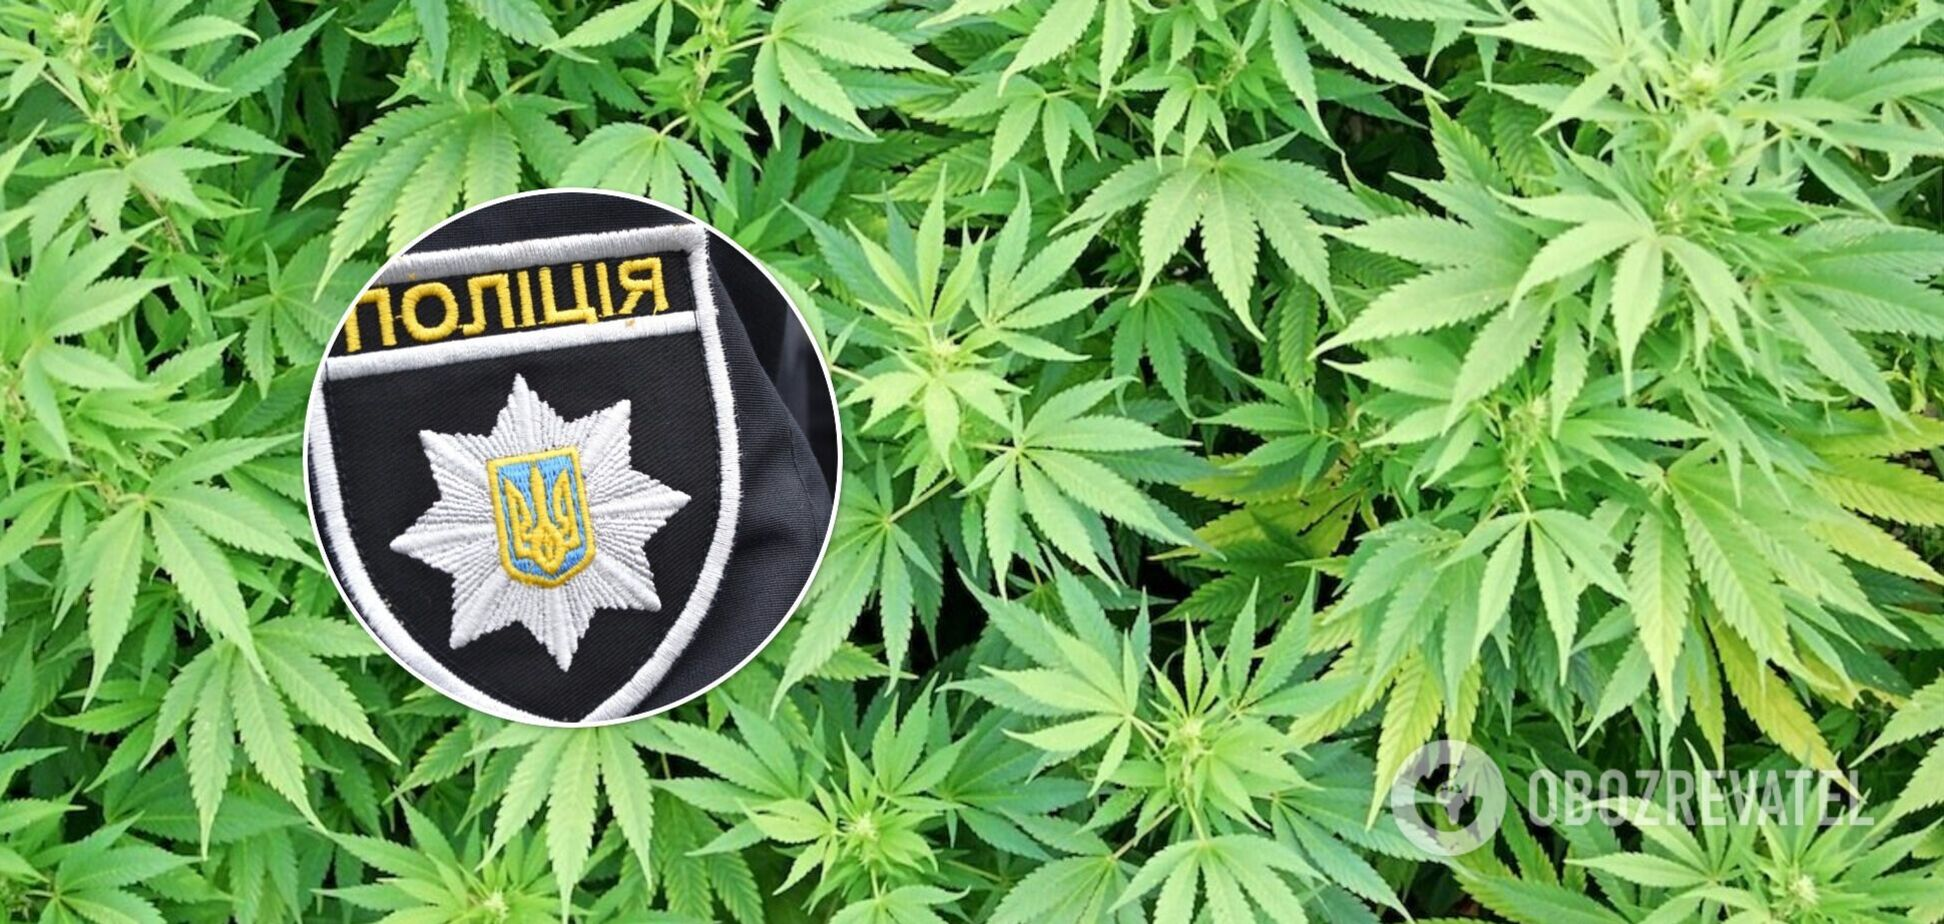 Под Одессой полицейские изъяли наркотиков на 7,5 млн гривен: зелье выращивали на огородах. Фото, видео